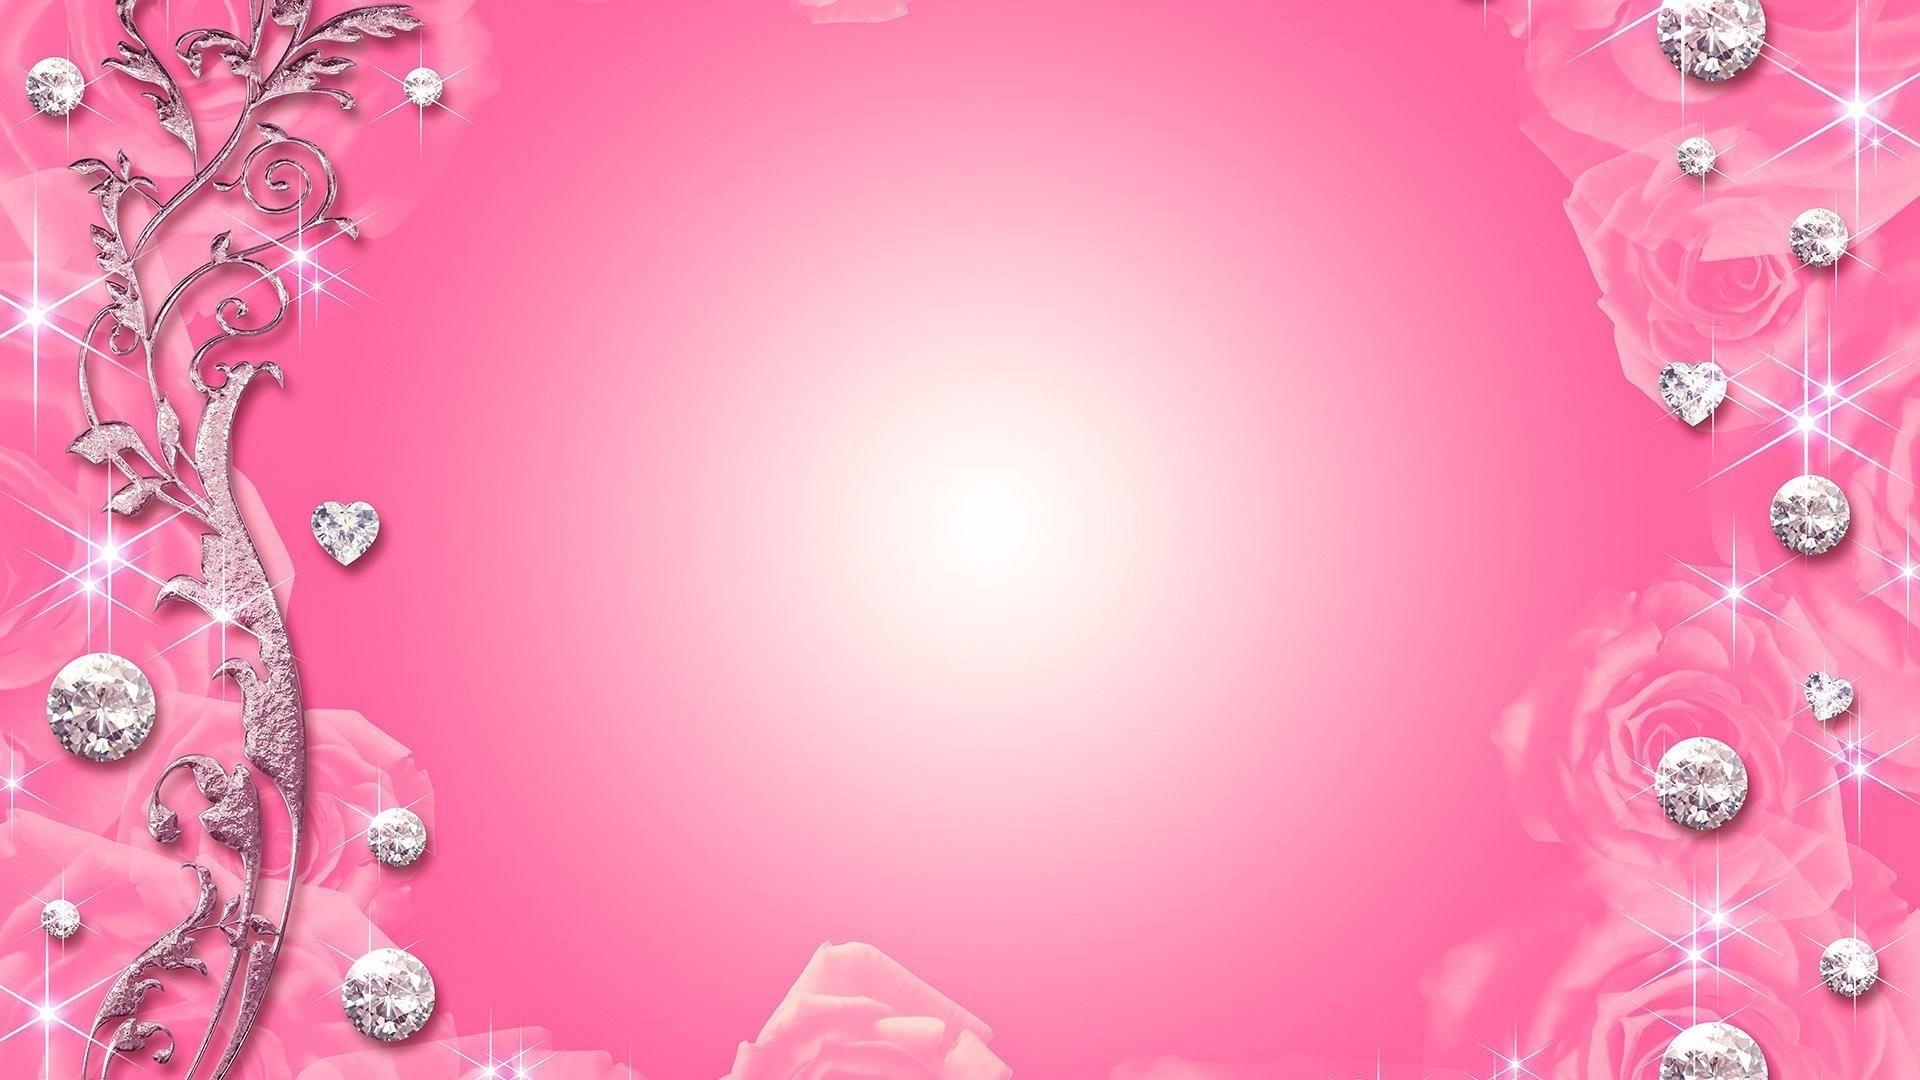 Pusheen Iphone Wallpaper Cute Sparkle Pink Wallpaper 56 Images